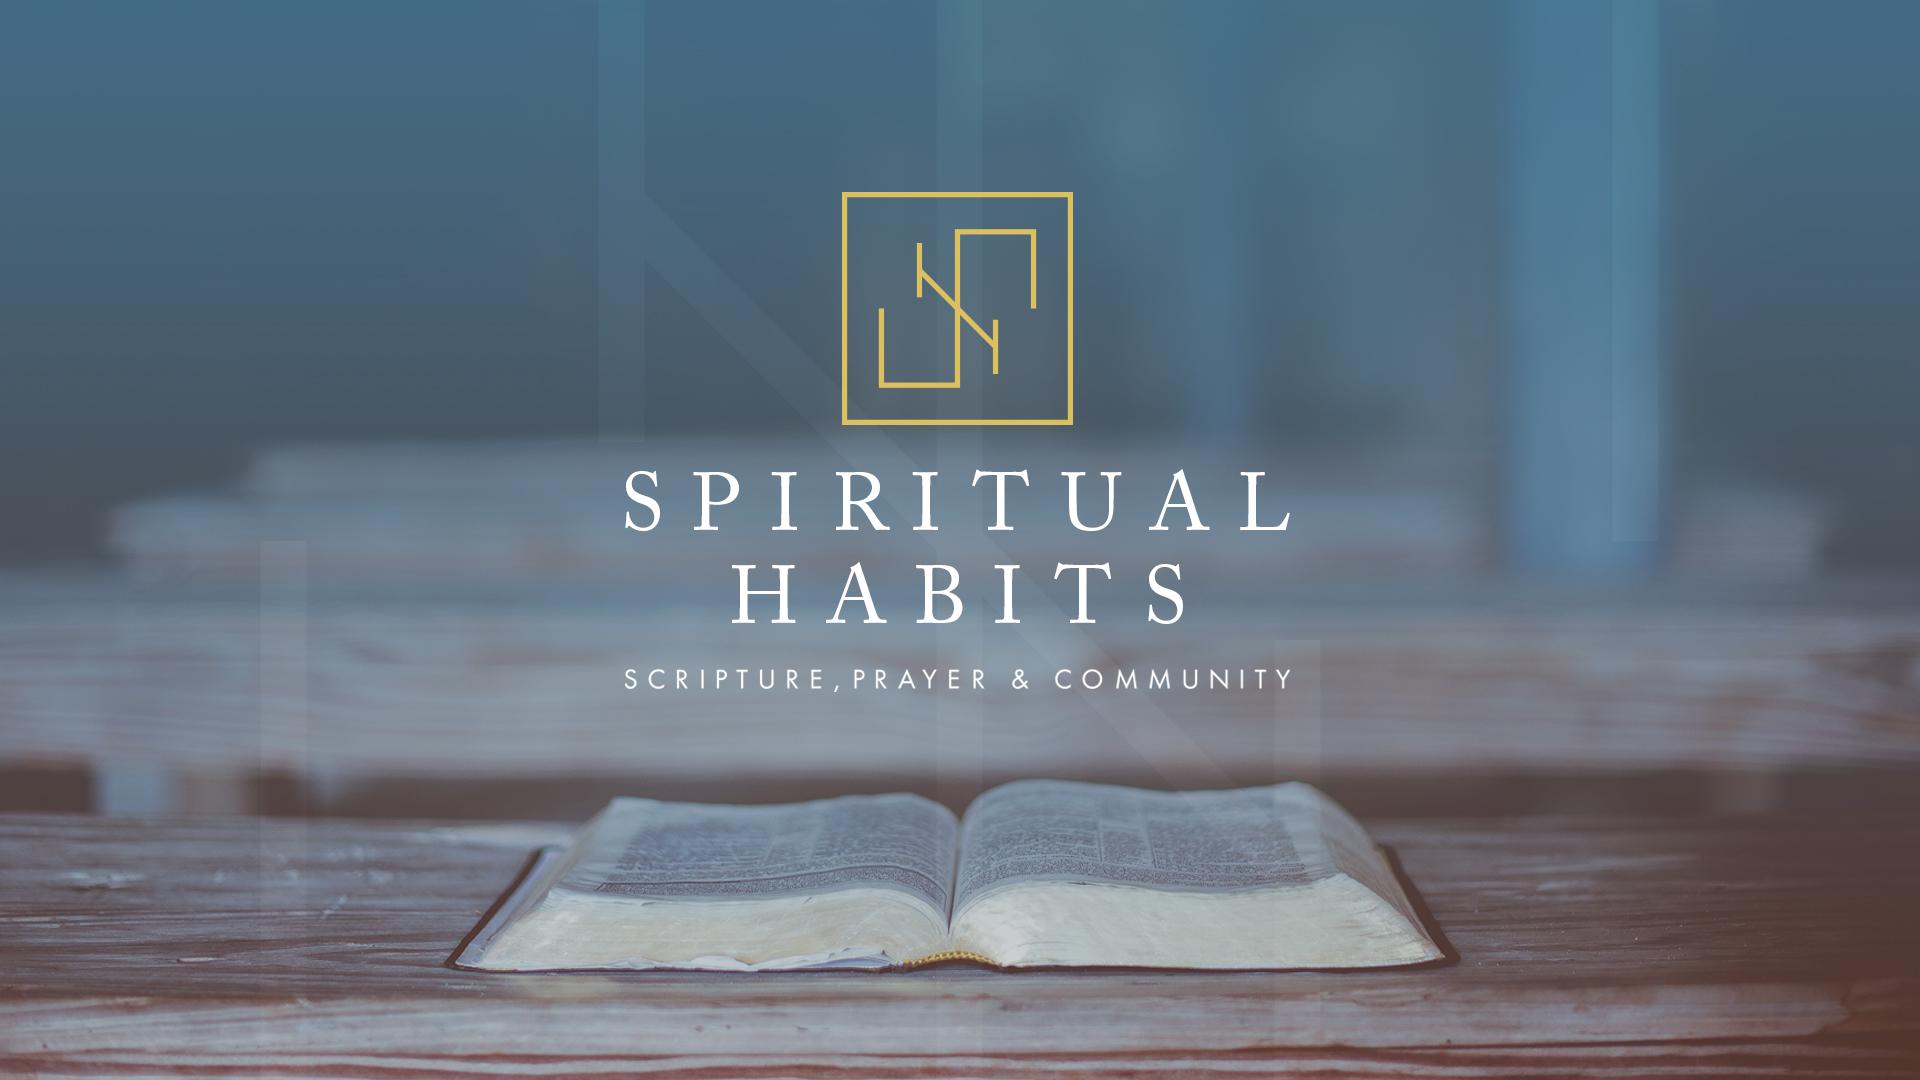 Spiritual-Habits_Title-Slide.jpg